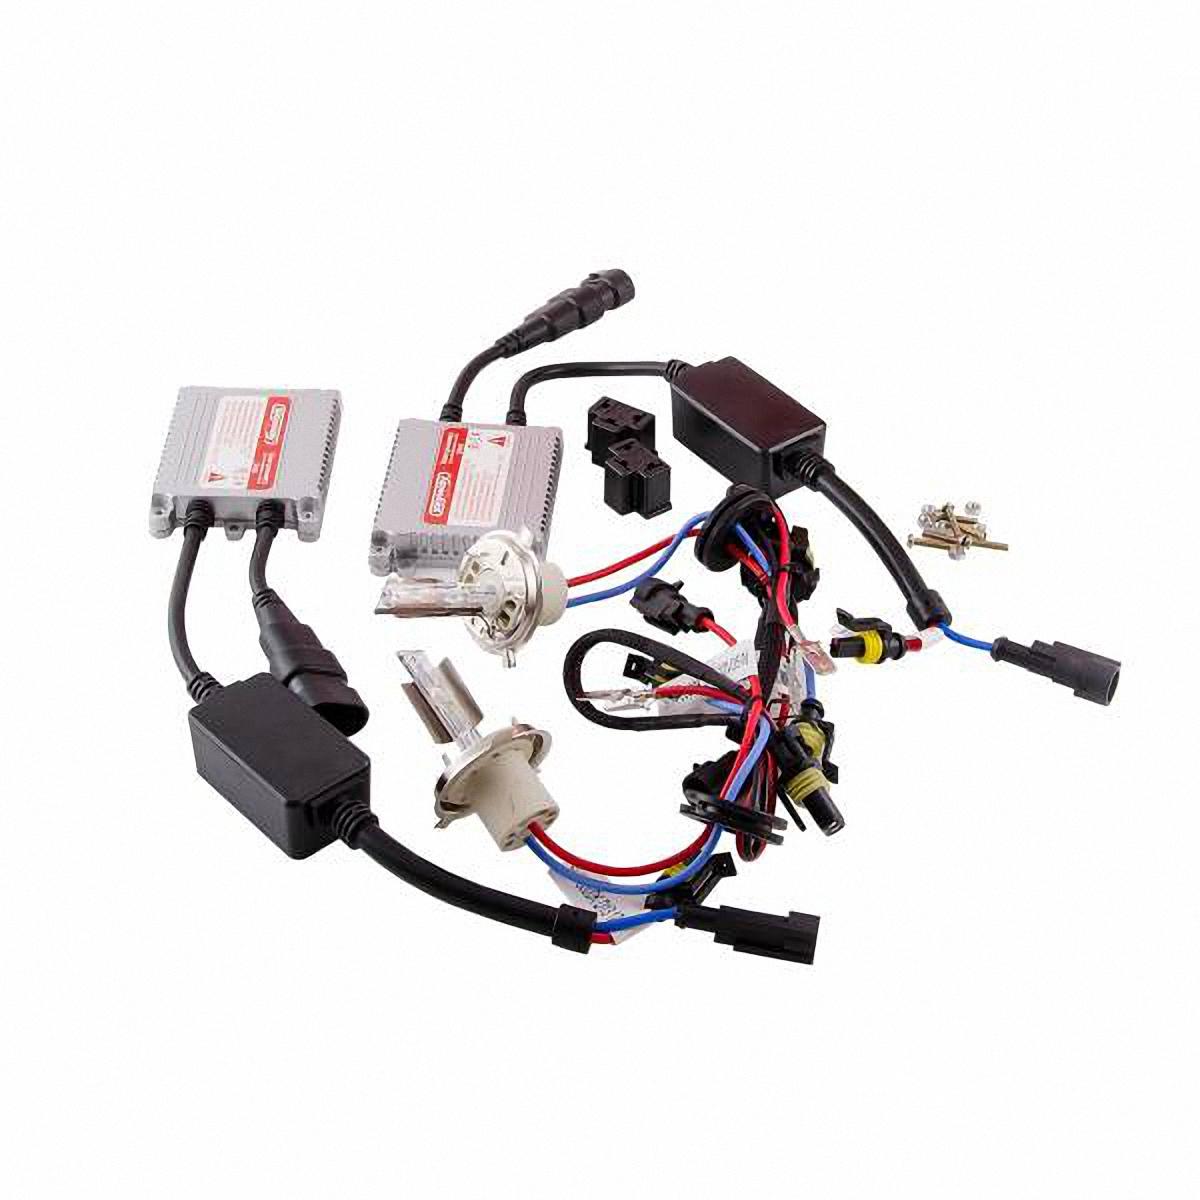 Skyway Автолампа ксенон H4. SH4 5000K D13 12V35WSH4 5000K D13 12V35WКомплектация:Лампа газоразрядная ксеноновая – 2 шт.Блок розжига – 2 шт.Винты для блока розжига – 6 шт.Гарантийный талон – 1 шт.Инструкция - 1 шт.